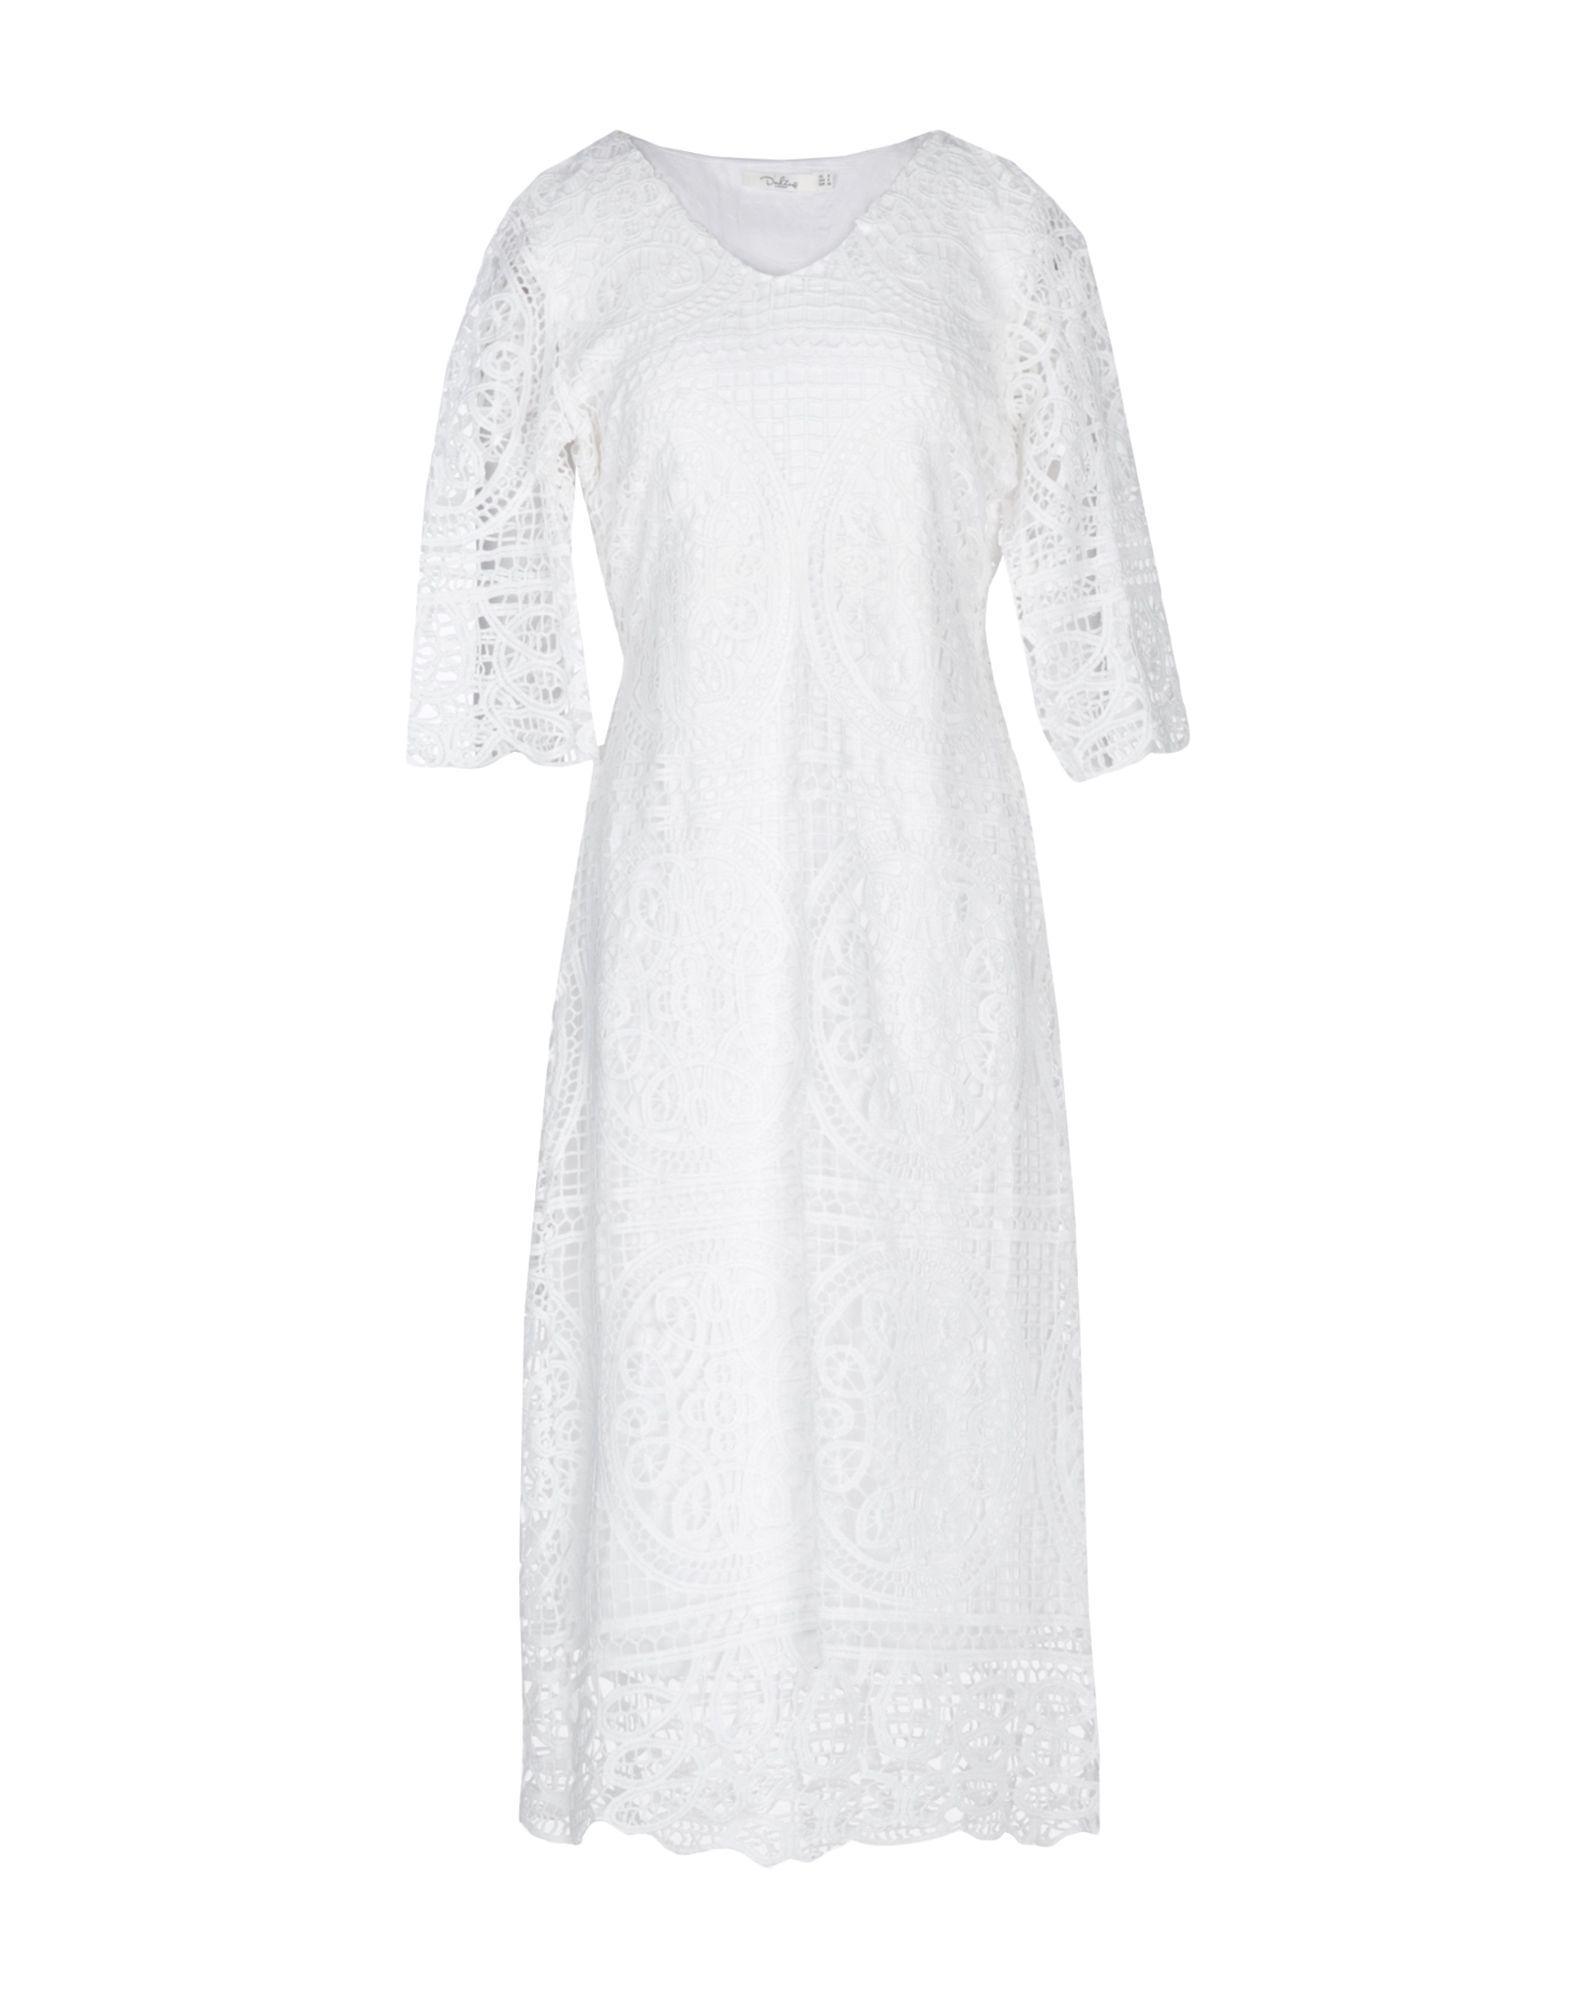 DRESSES - 3/4 length dresses Darling cJqqnT